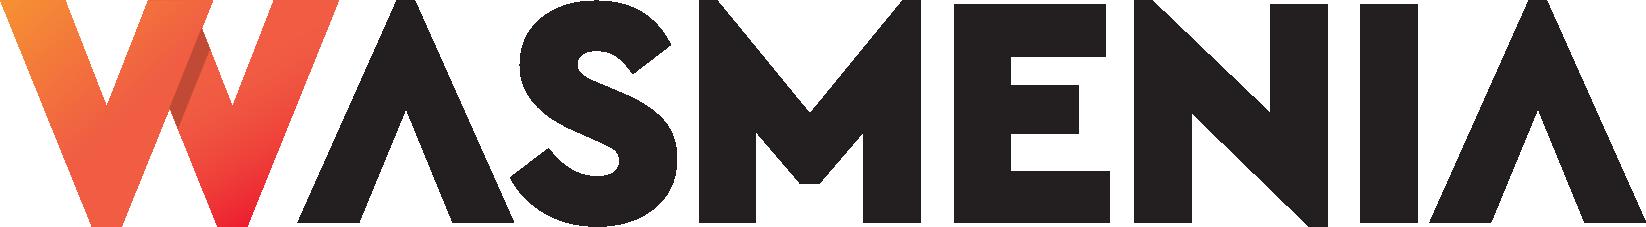 Wasmenia شعارات بدقة عالية Buick Logo Vehicle Logos Logos